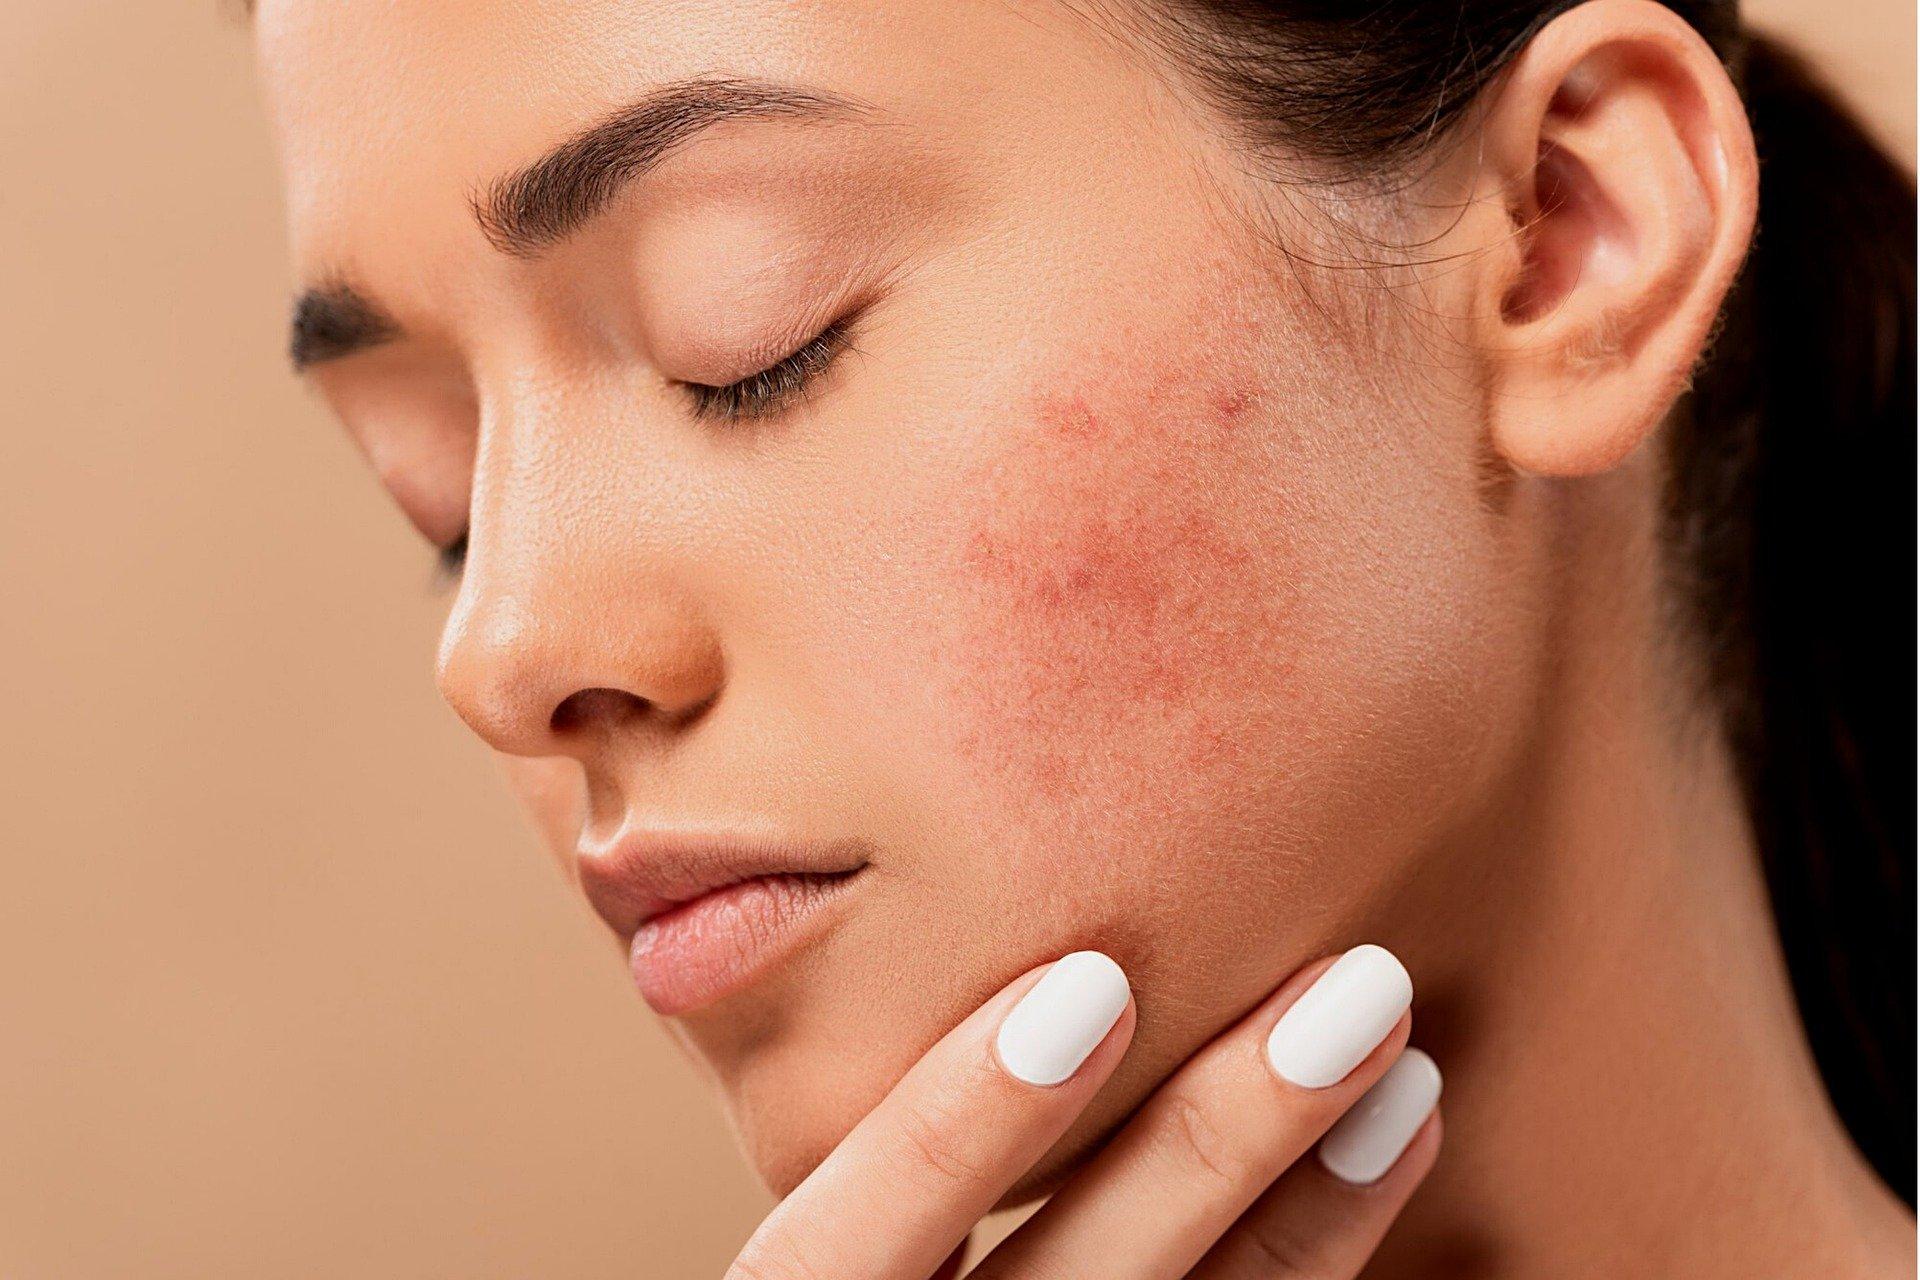 El estrés en la piel